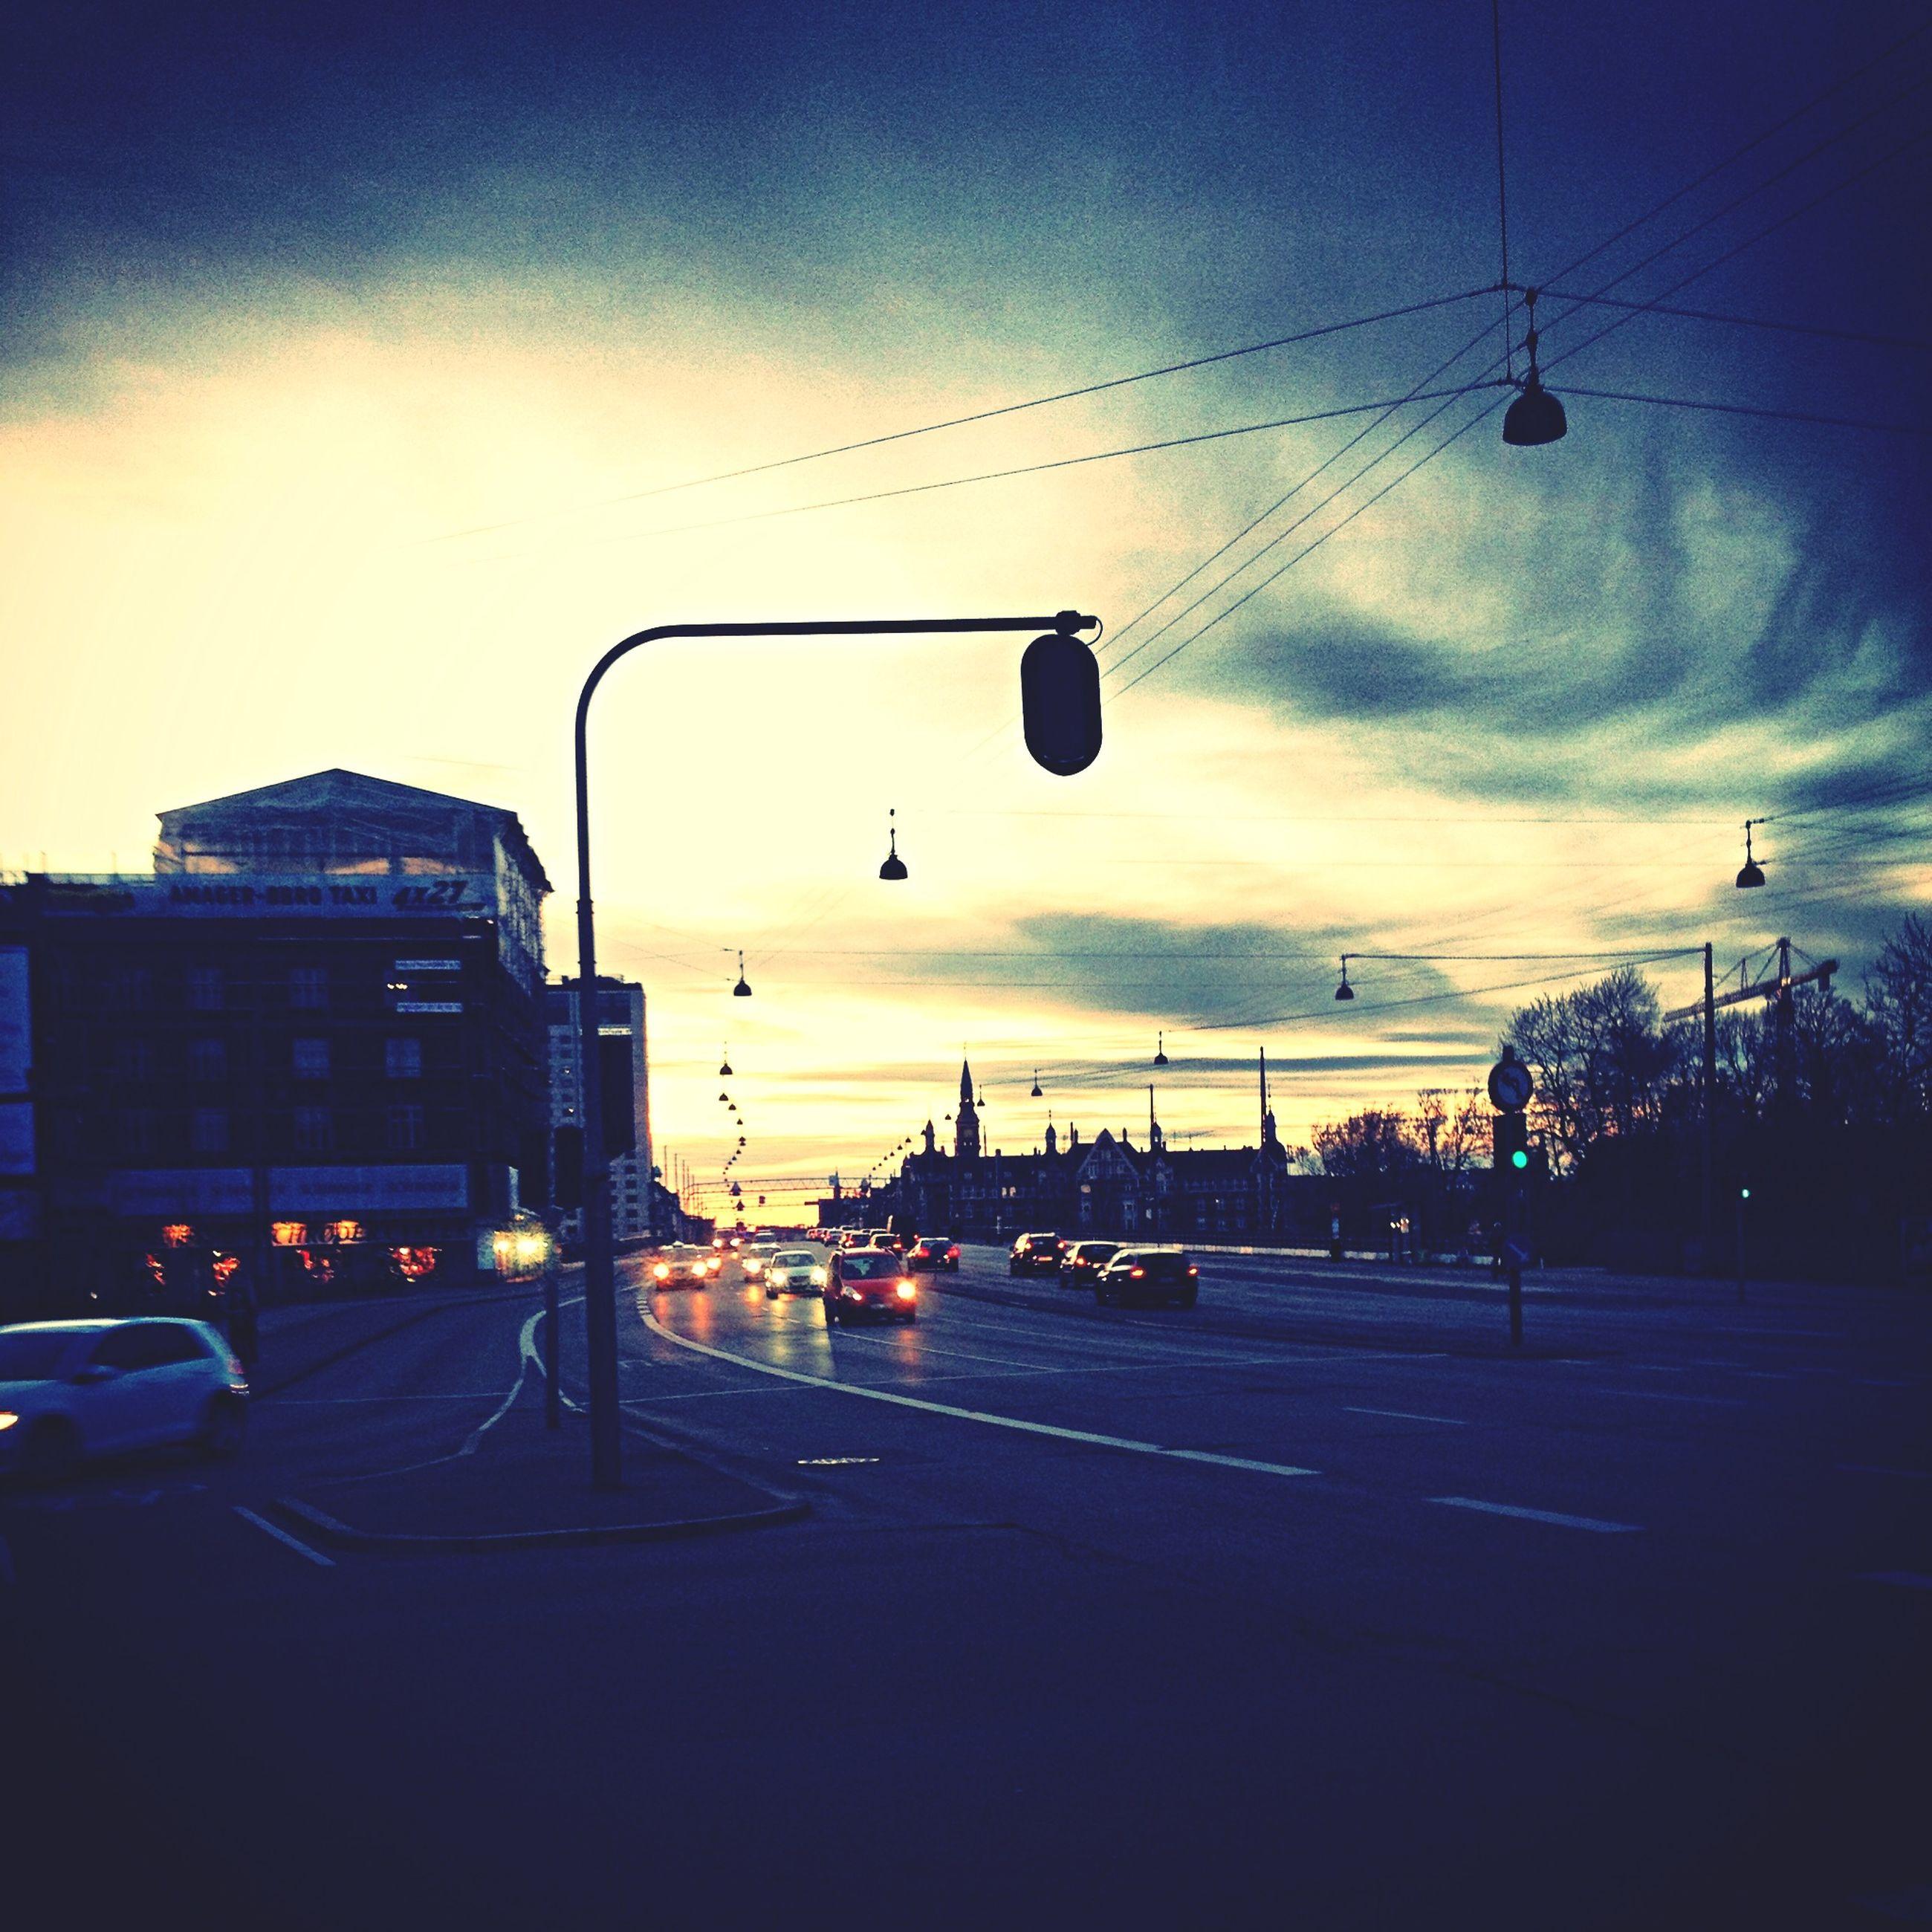 transportation, car, street light, land vehicle, sky, illuminated, mode of transport, road, street, sunset, building exterior, built structure, traffic, cloud - sky, architecture, lighting equipment, city, dusk, city street, road marking